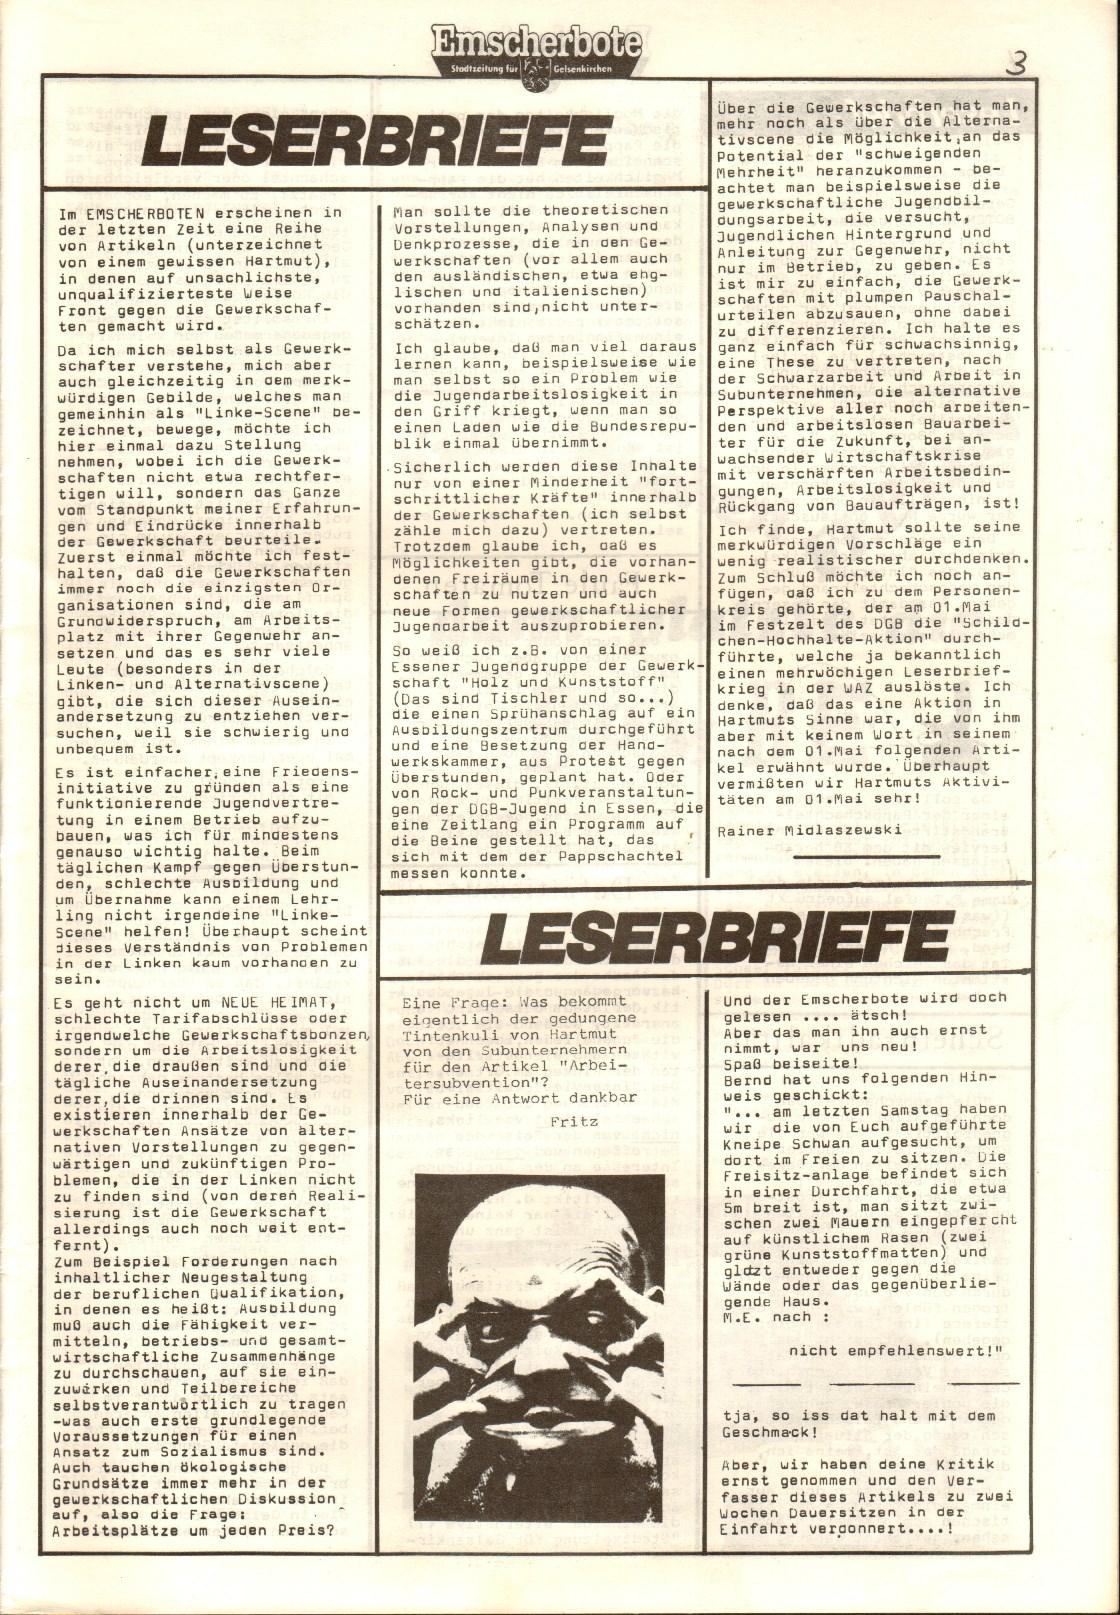 Gelsenkirchen_Emscherbote_1982_20_03